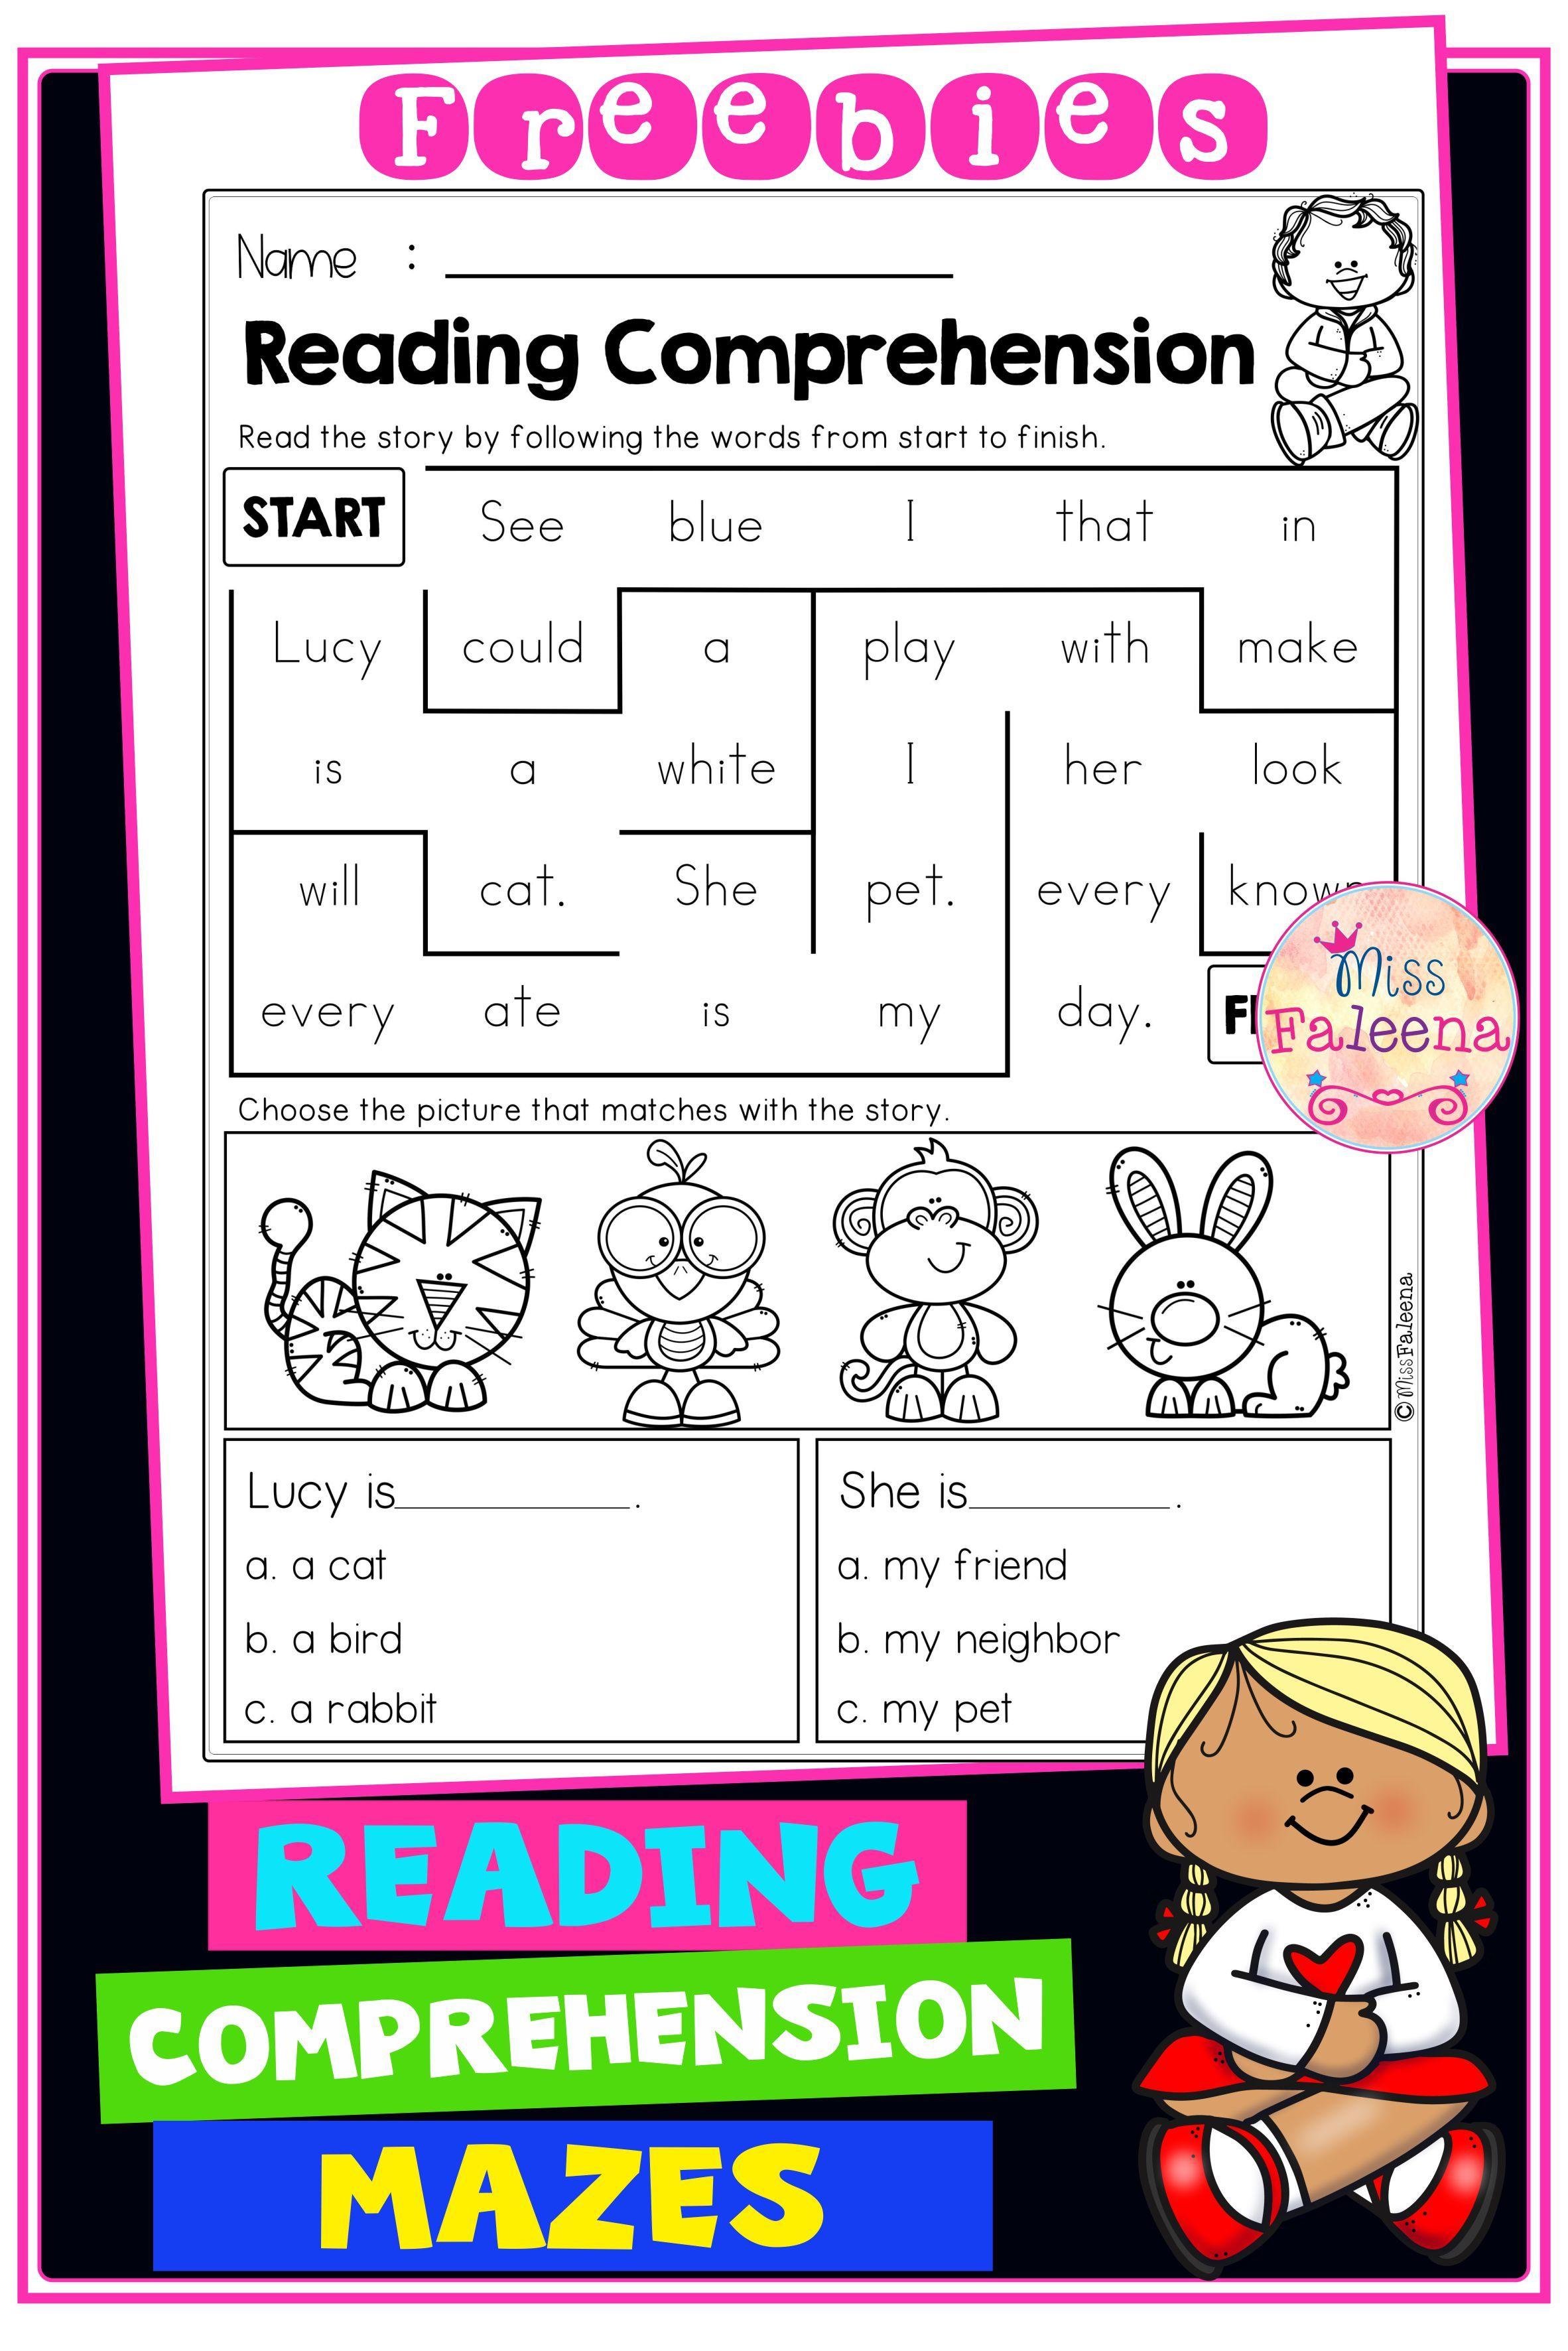 Free Reading Comprehension Mazes Reading Comprehension Reading Comprehension Worksheets Reading Comprehension Strategies [ 3544 x 2364 Pixel ]